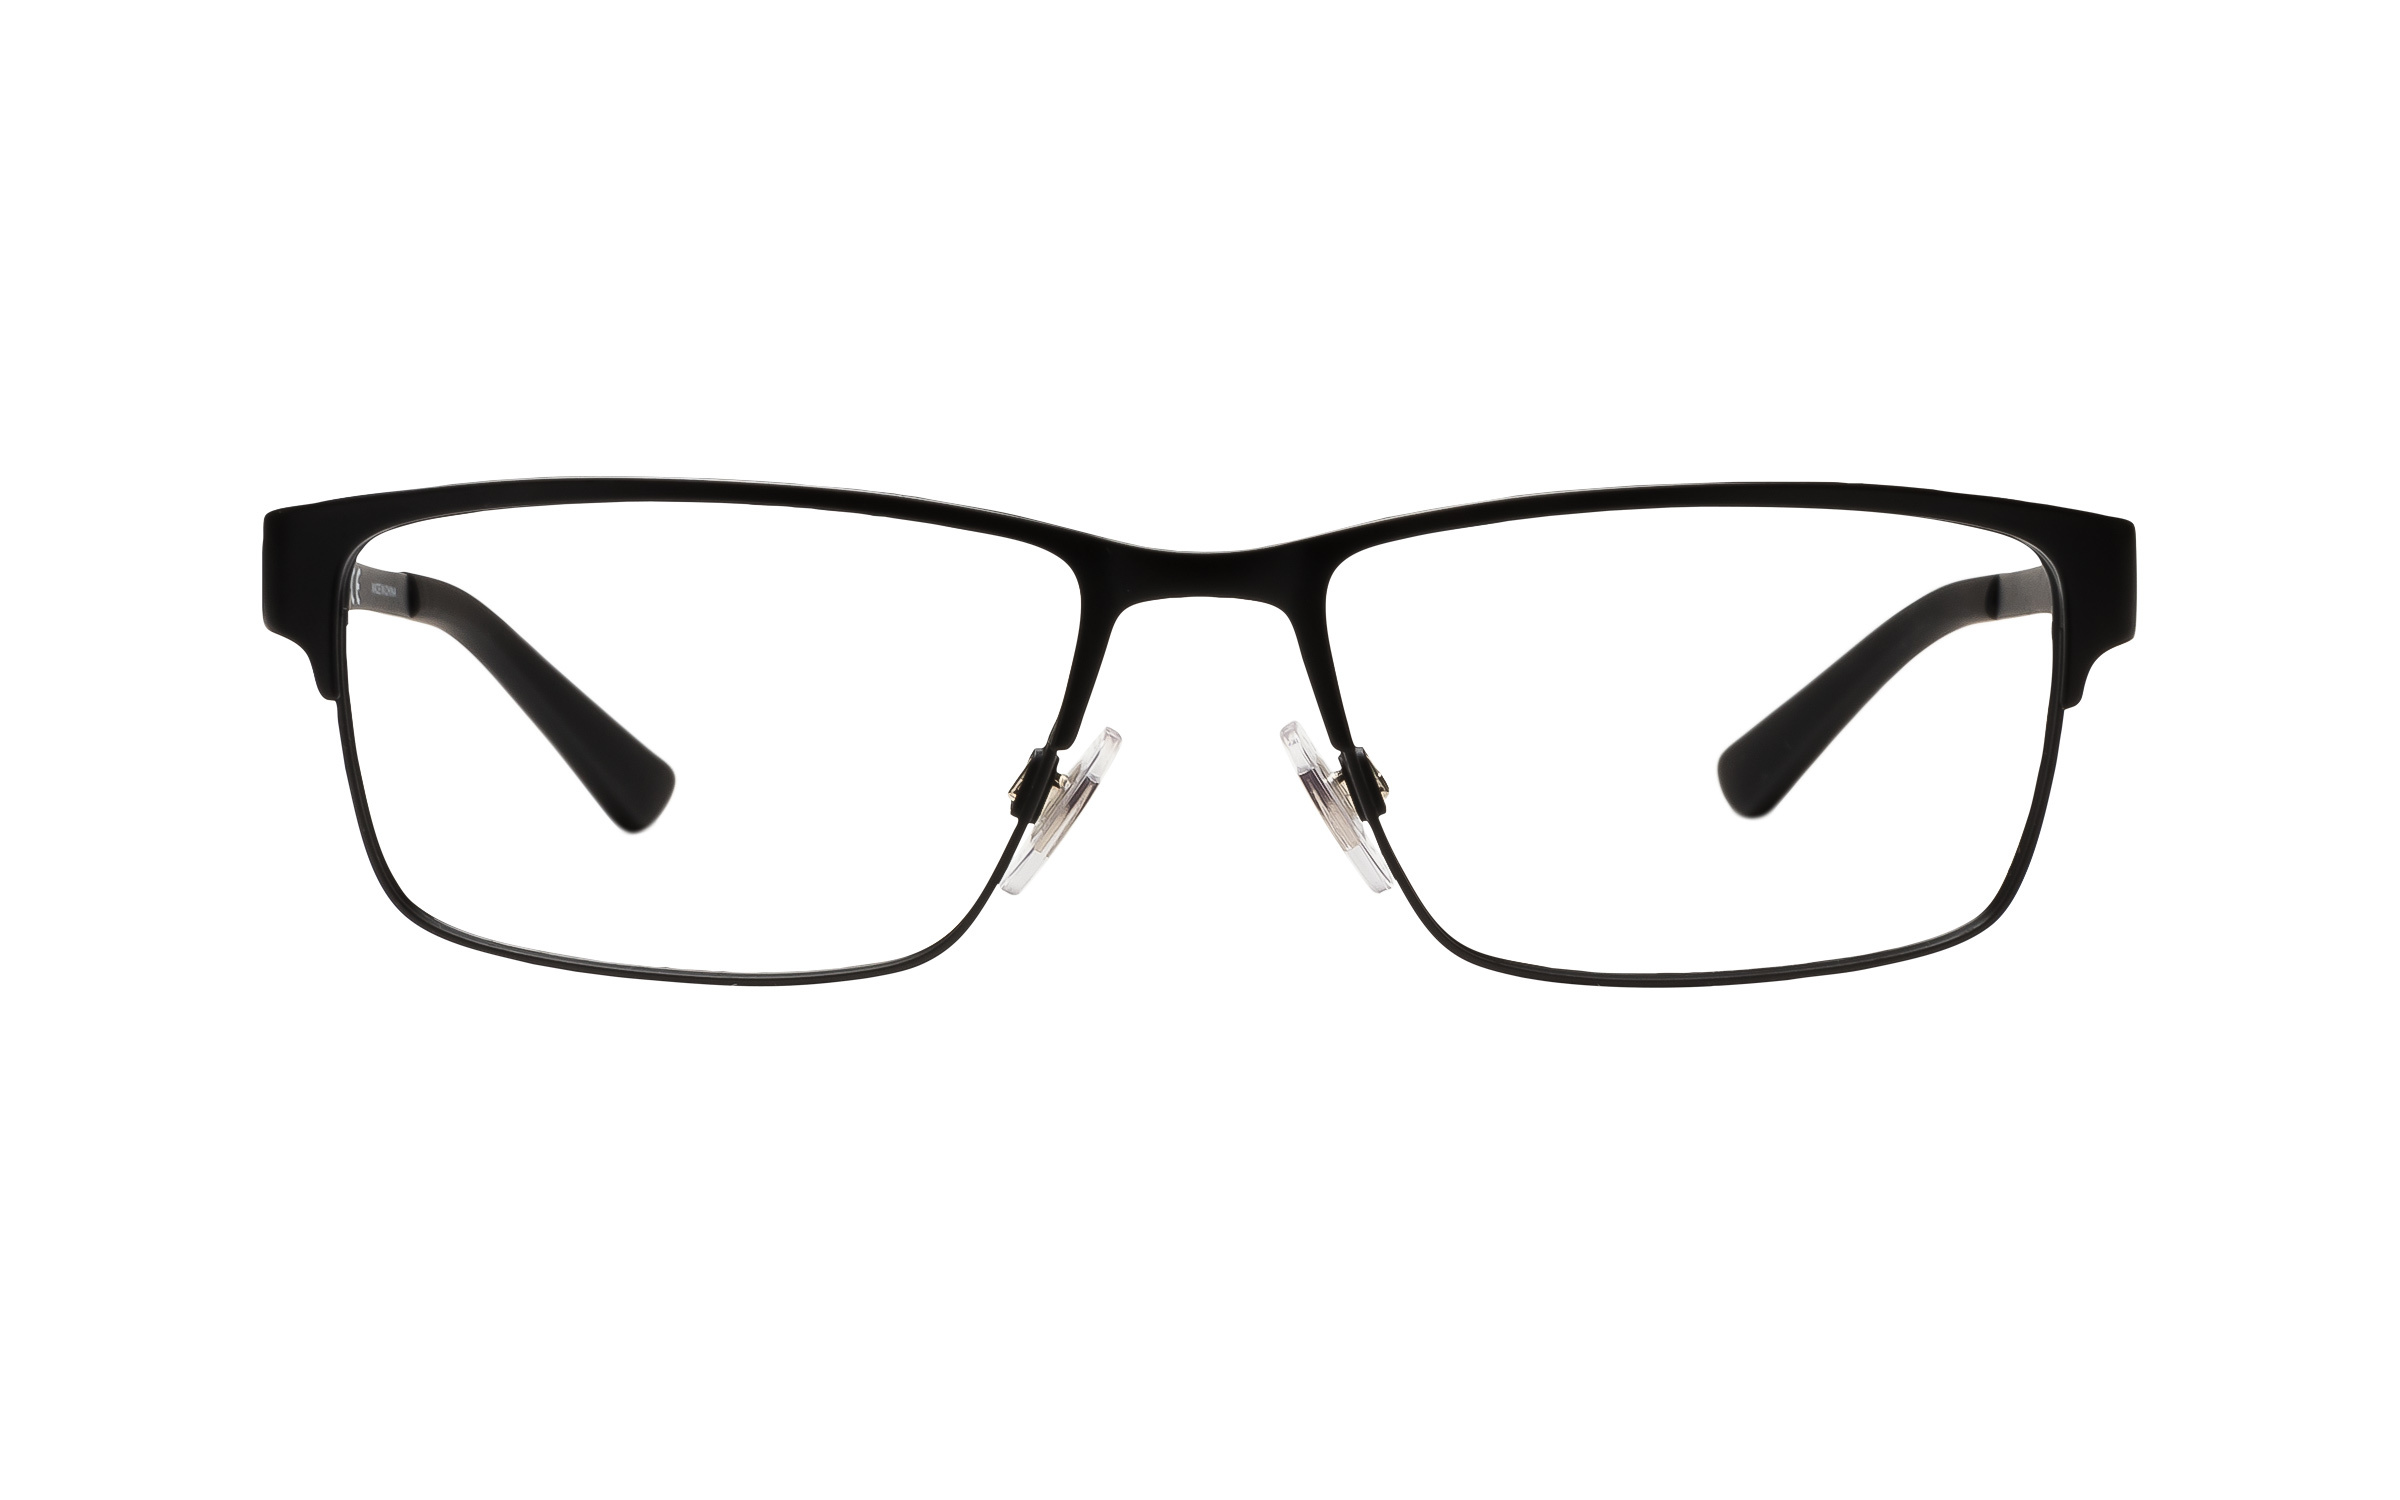 Luxottica Polo Ralph Lauren PH1147 9038 (54) Eyeglasses and Frame in Matte Black | Acetate/Plastic/Metal - Online Coastal